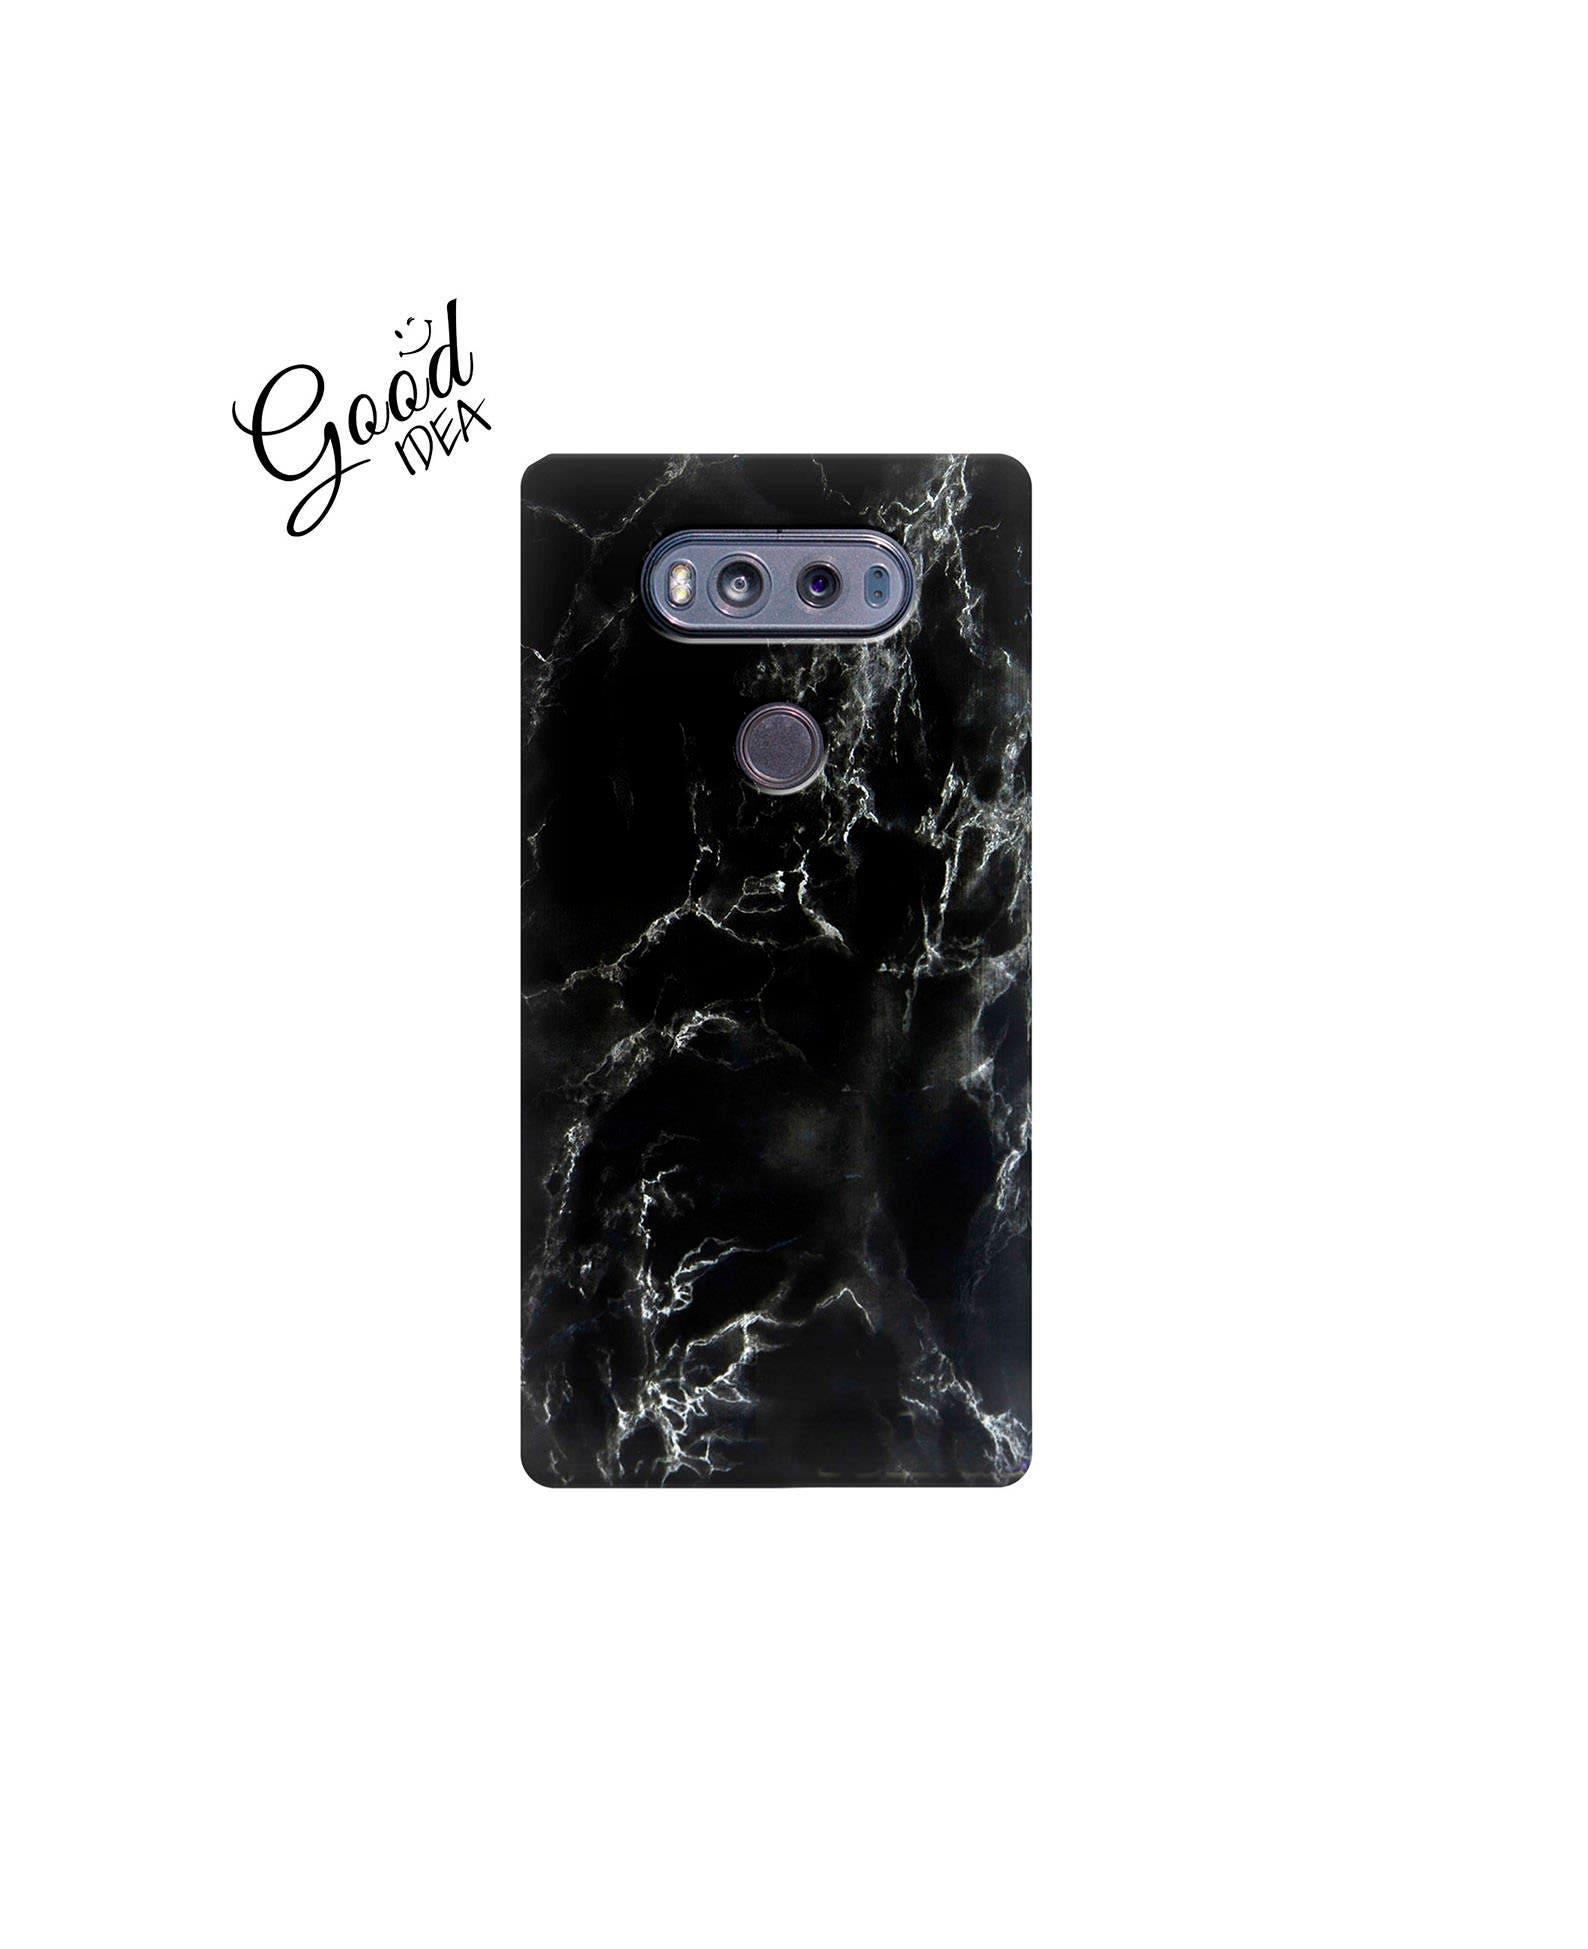 Electronics Cases Custom Hardcase Midnight Dots Iphone 4 5 5c 6 Plus 7 Case 6s For Samsung Note Mandala Wc1119 Old Price1199 Lg V10 V20 Black Marble K4 K10